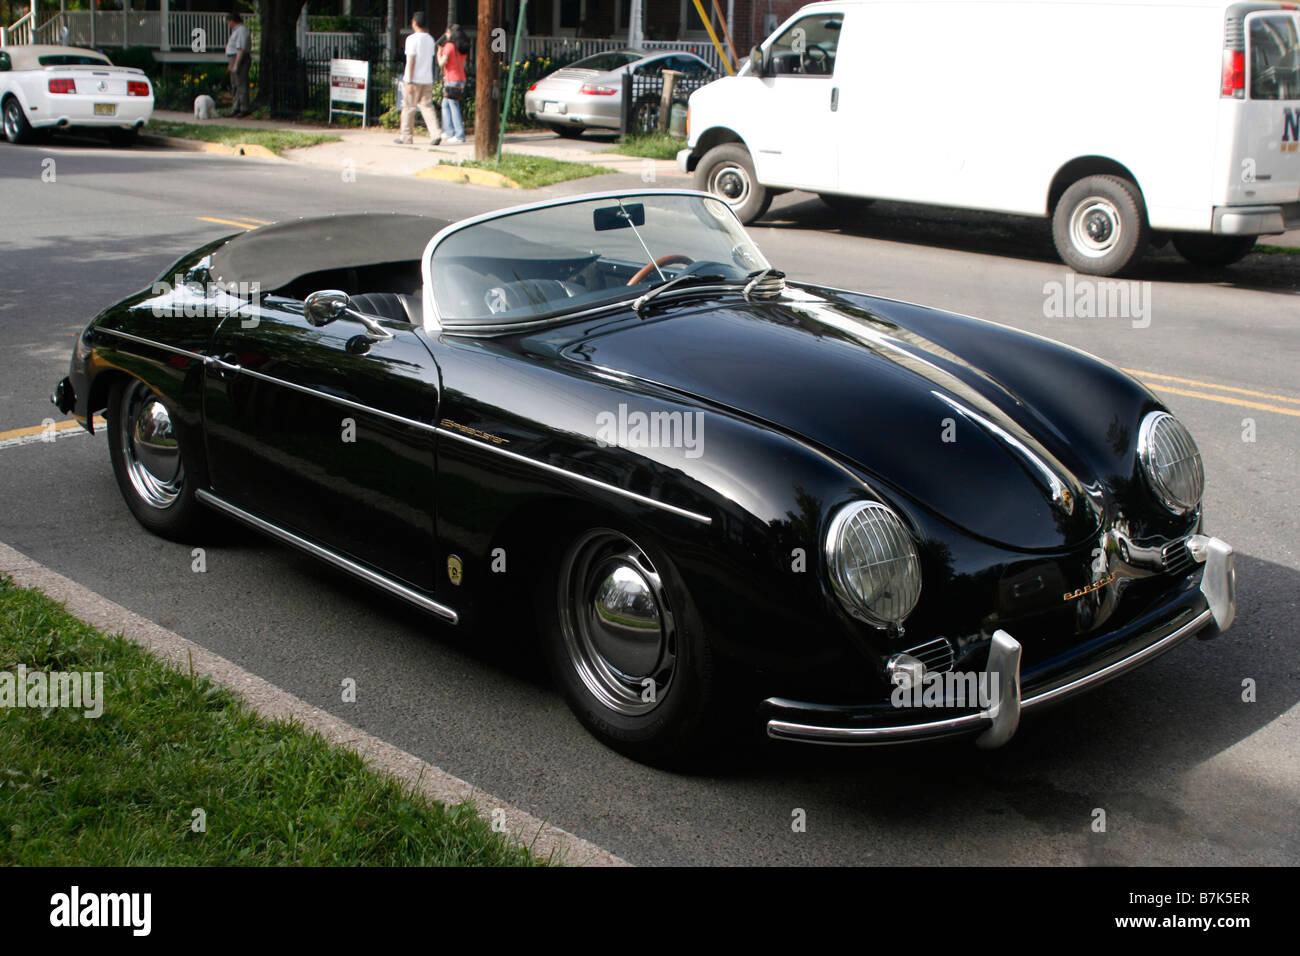 Classic Porsche Speedster Black Convertible Stock Photo Alamy